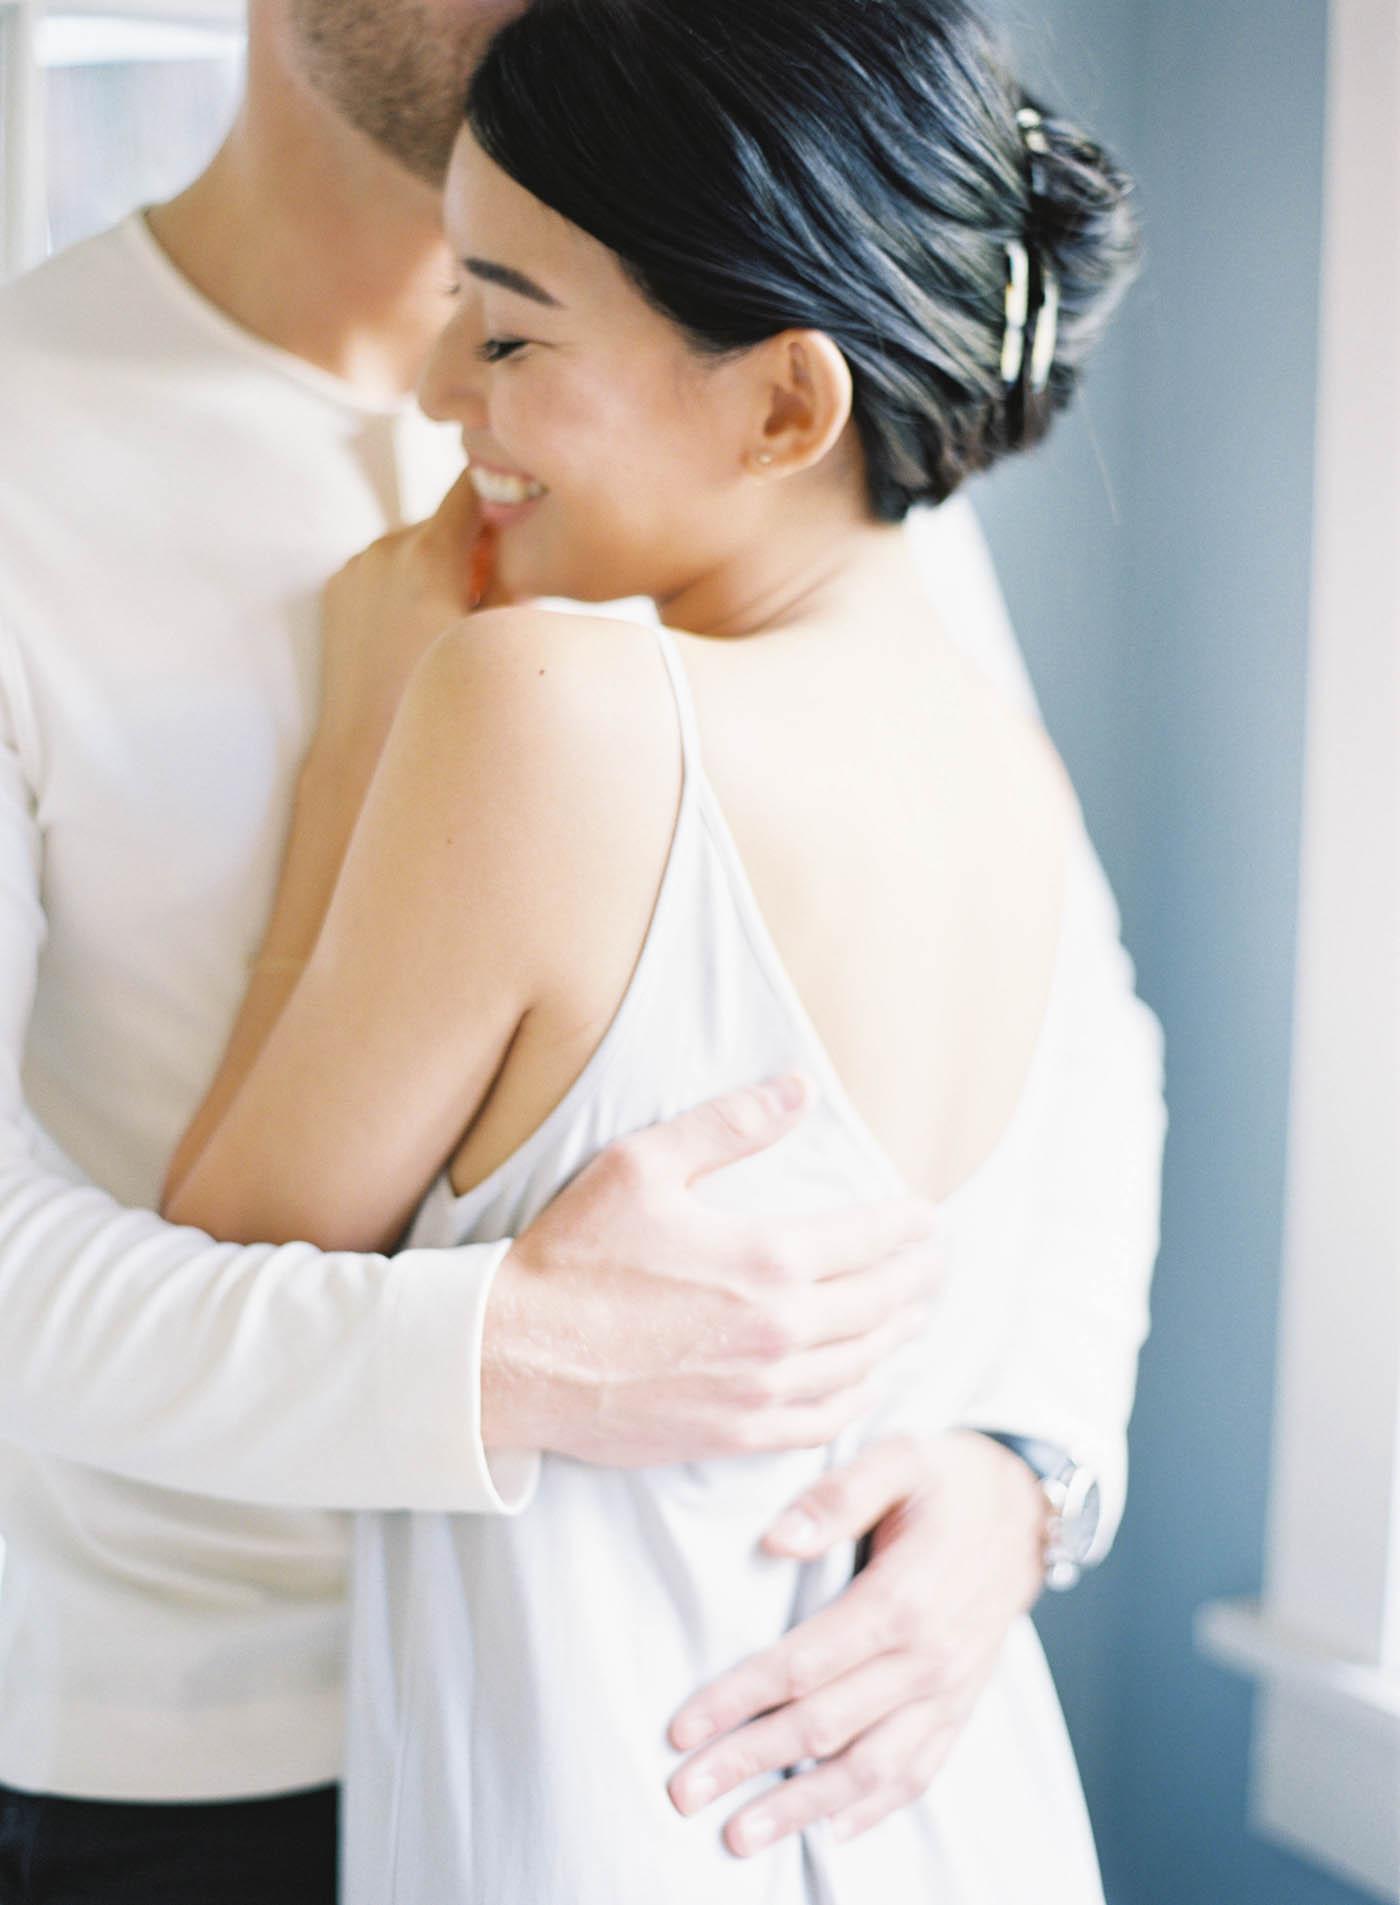 riviera-house-engagement-121-Jen_Huang-Tea-Ceremony-359-Jen_Huang-004147-R1-001.jpg